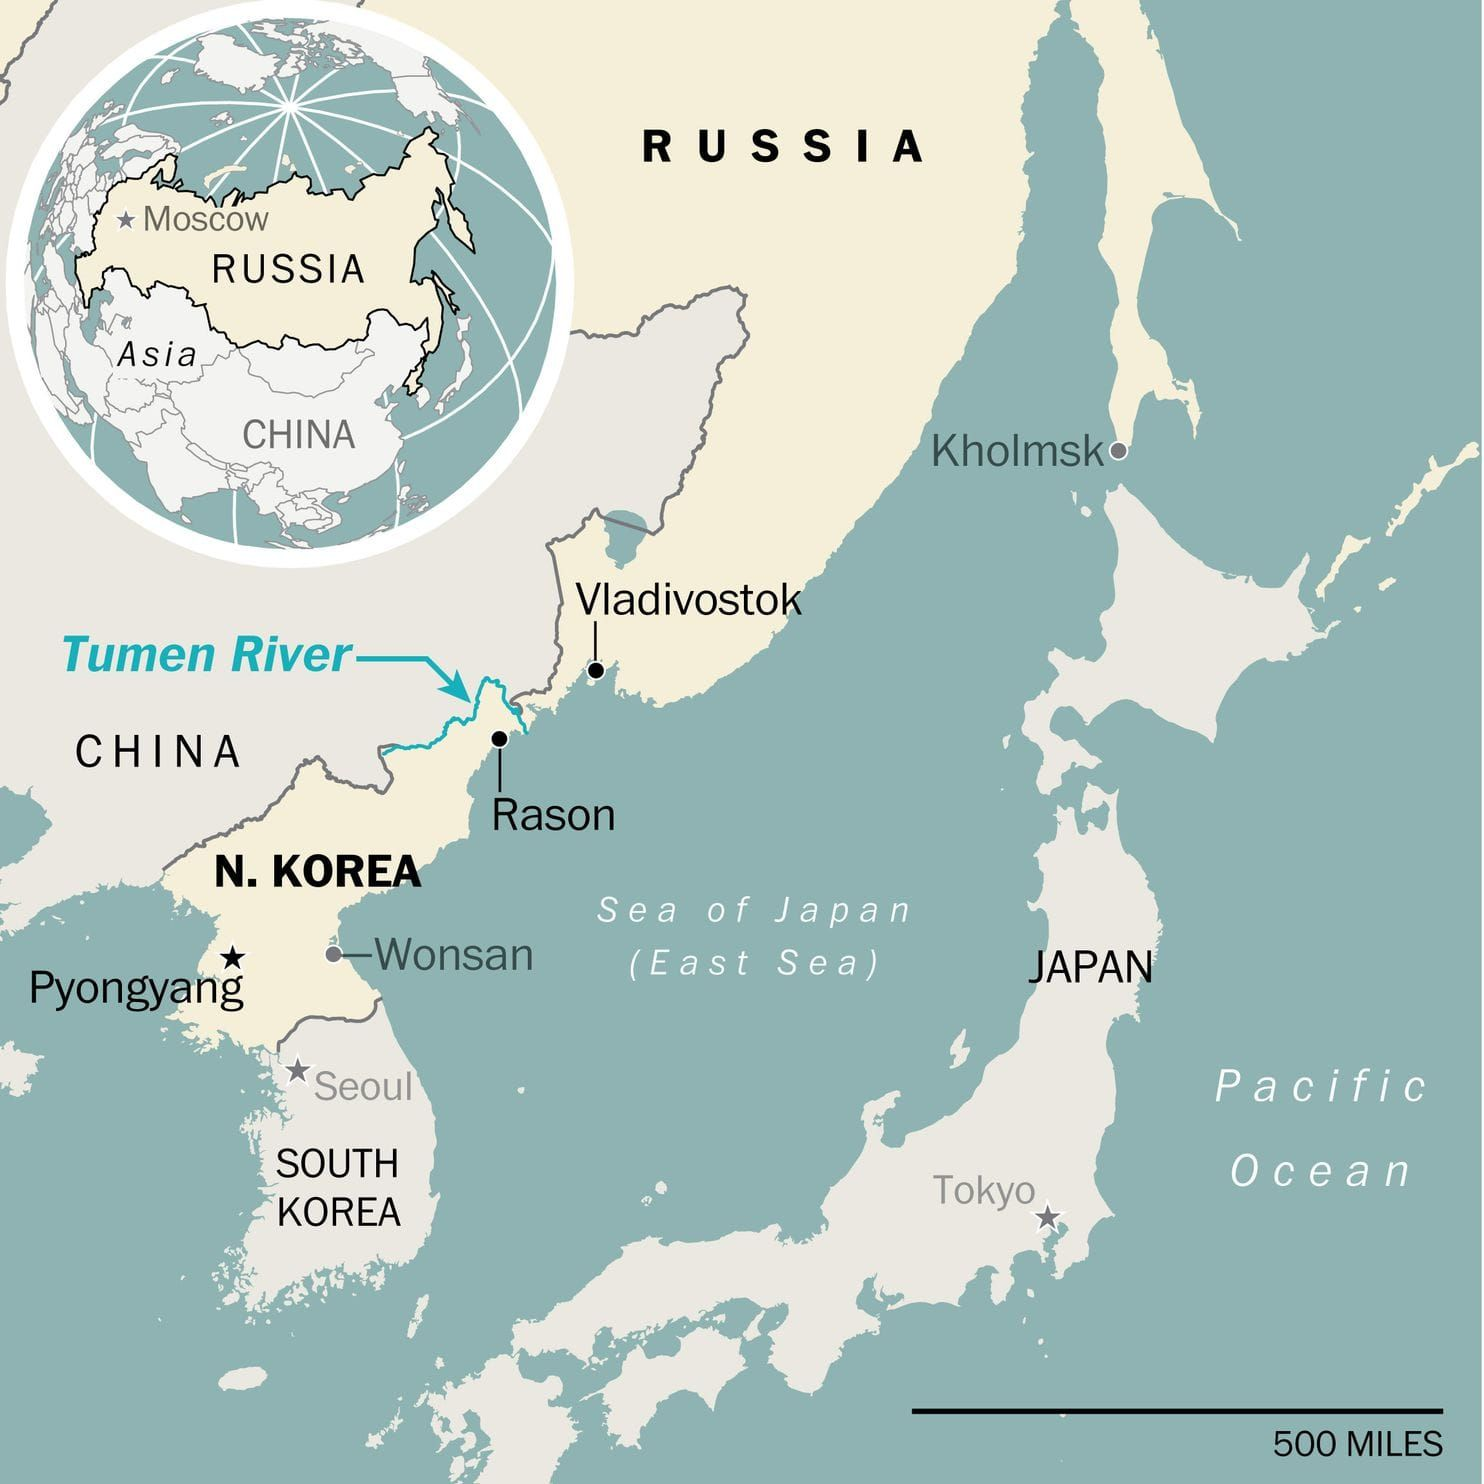 Russia Wants To Build A Bridge To North Korea Literally Russia